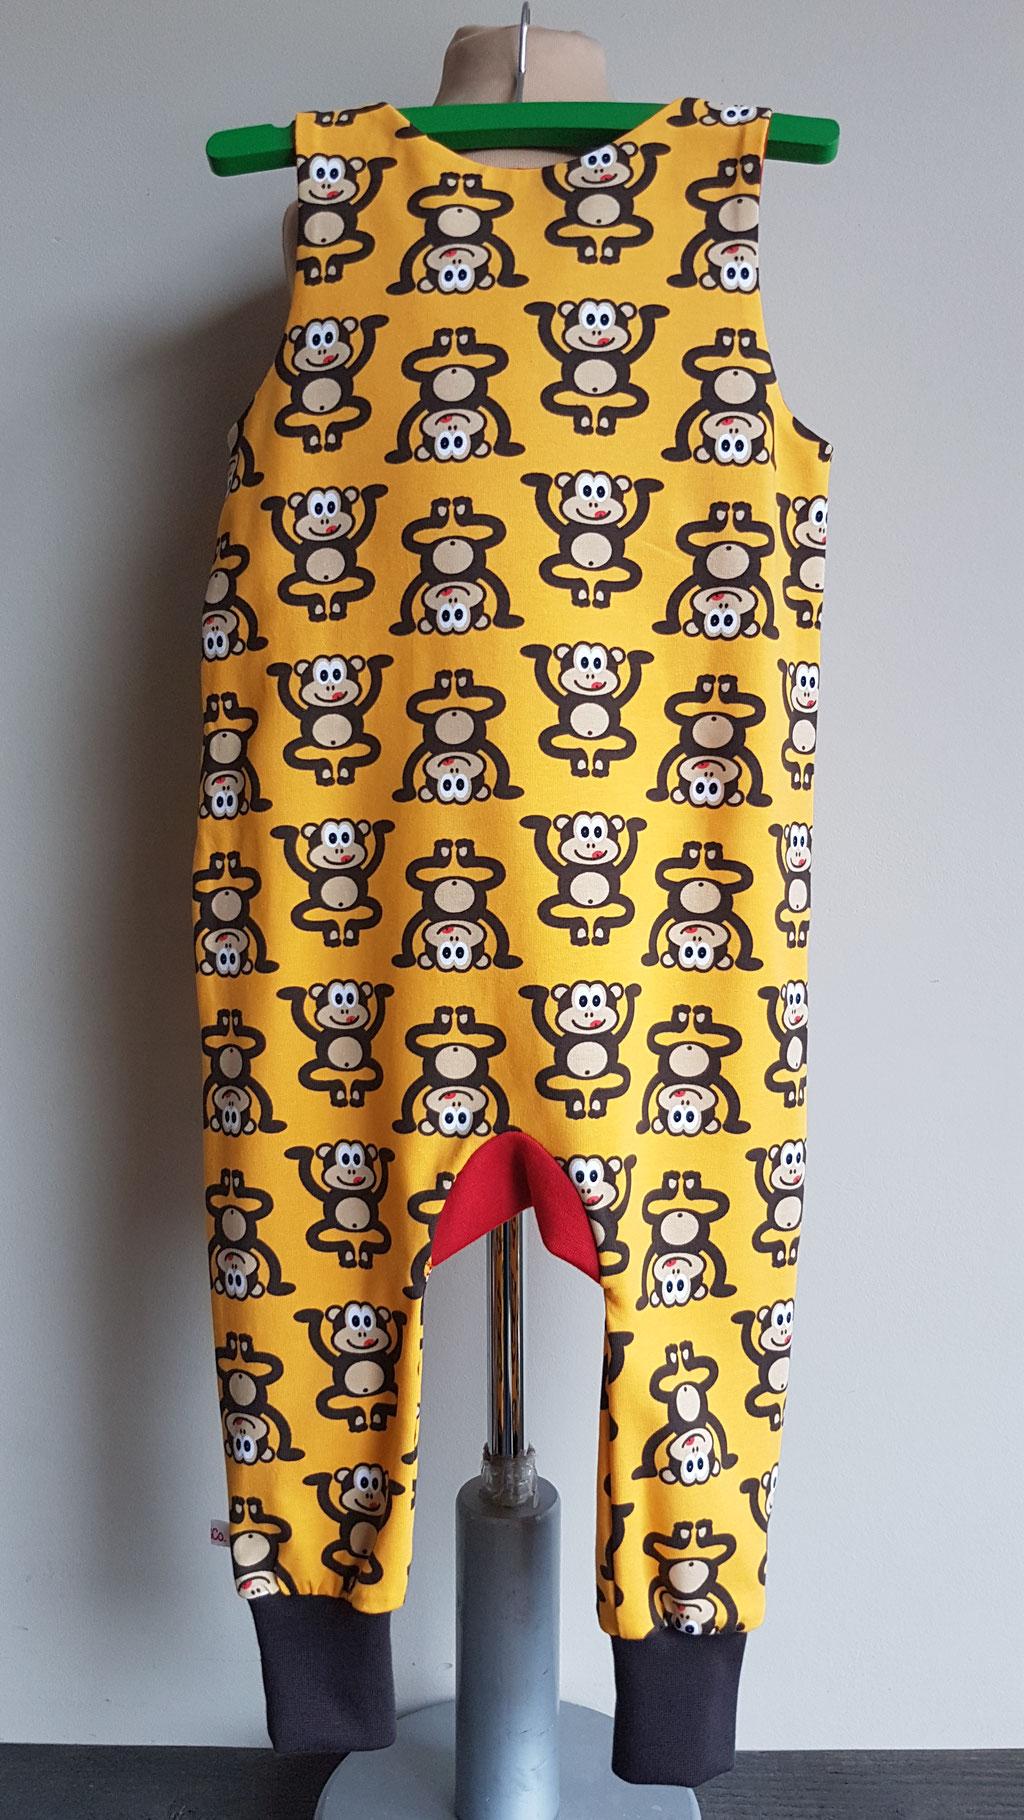 Achter: Monkey business (geel)